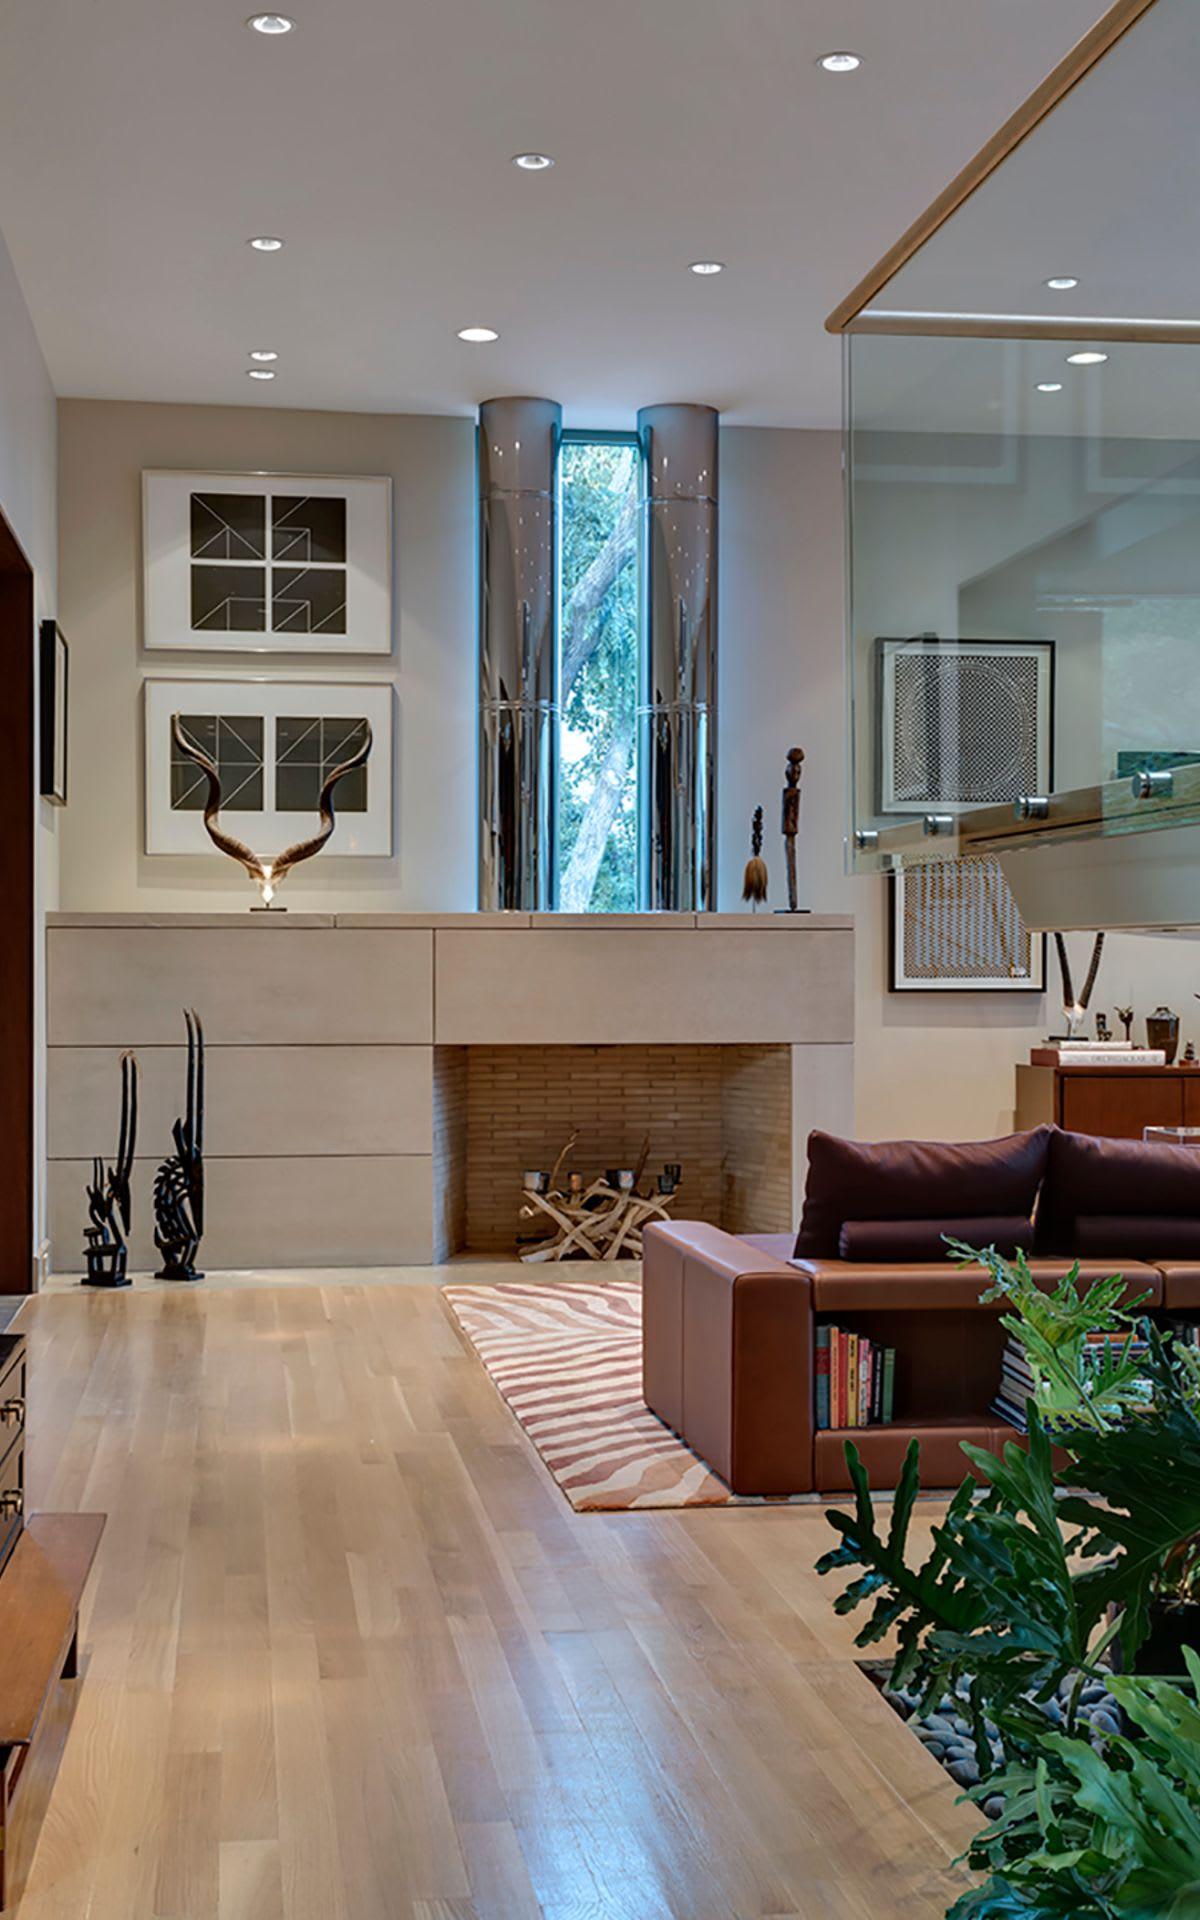 Interior image 31